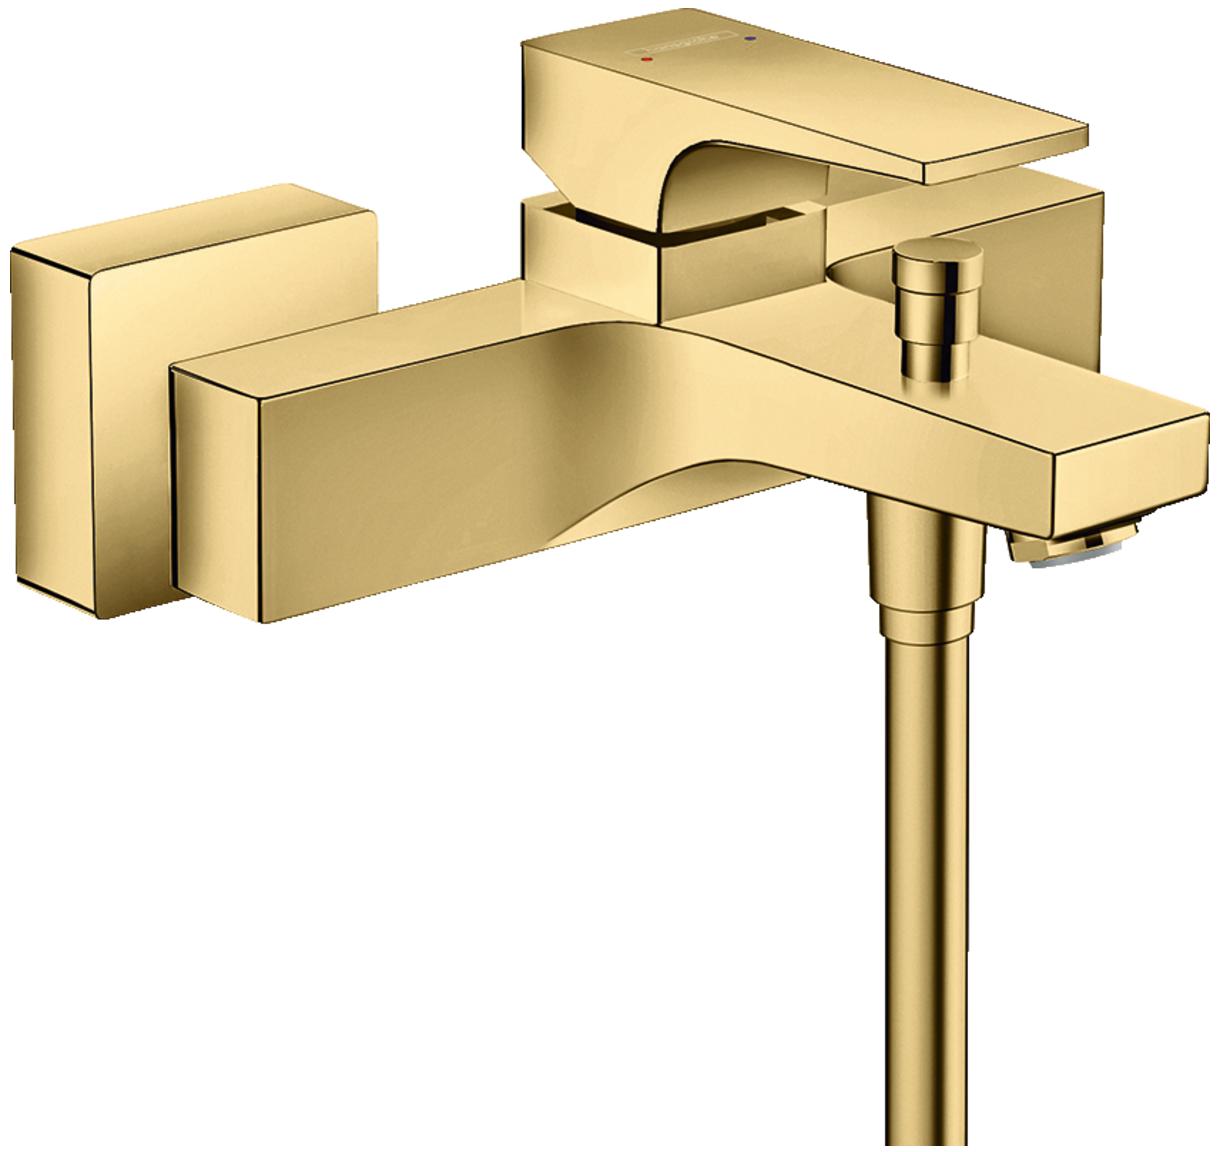 Mitigeur de bain / douche Hansgrohe Metropol aspect doré poli